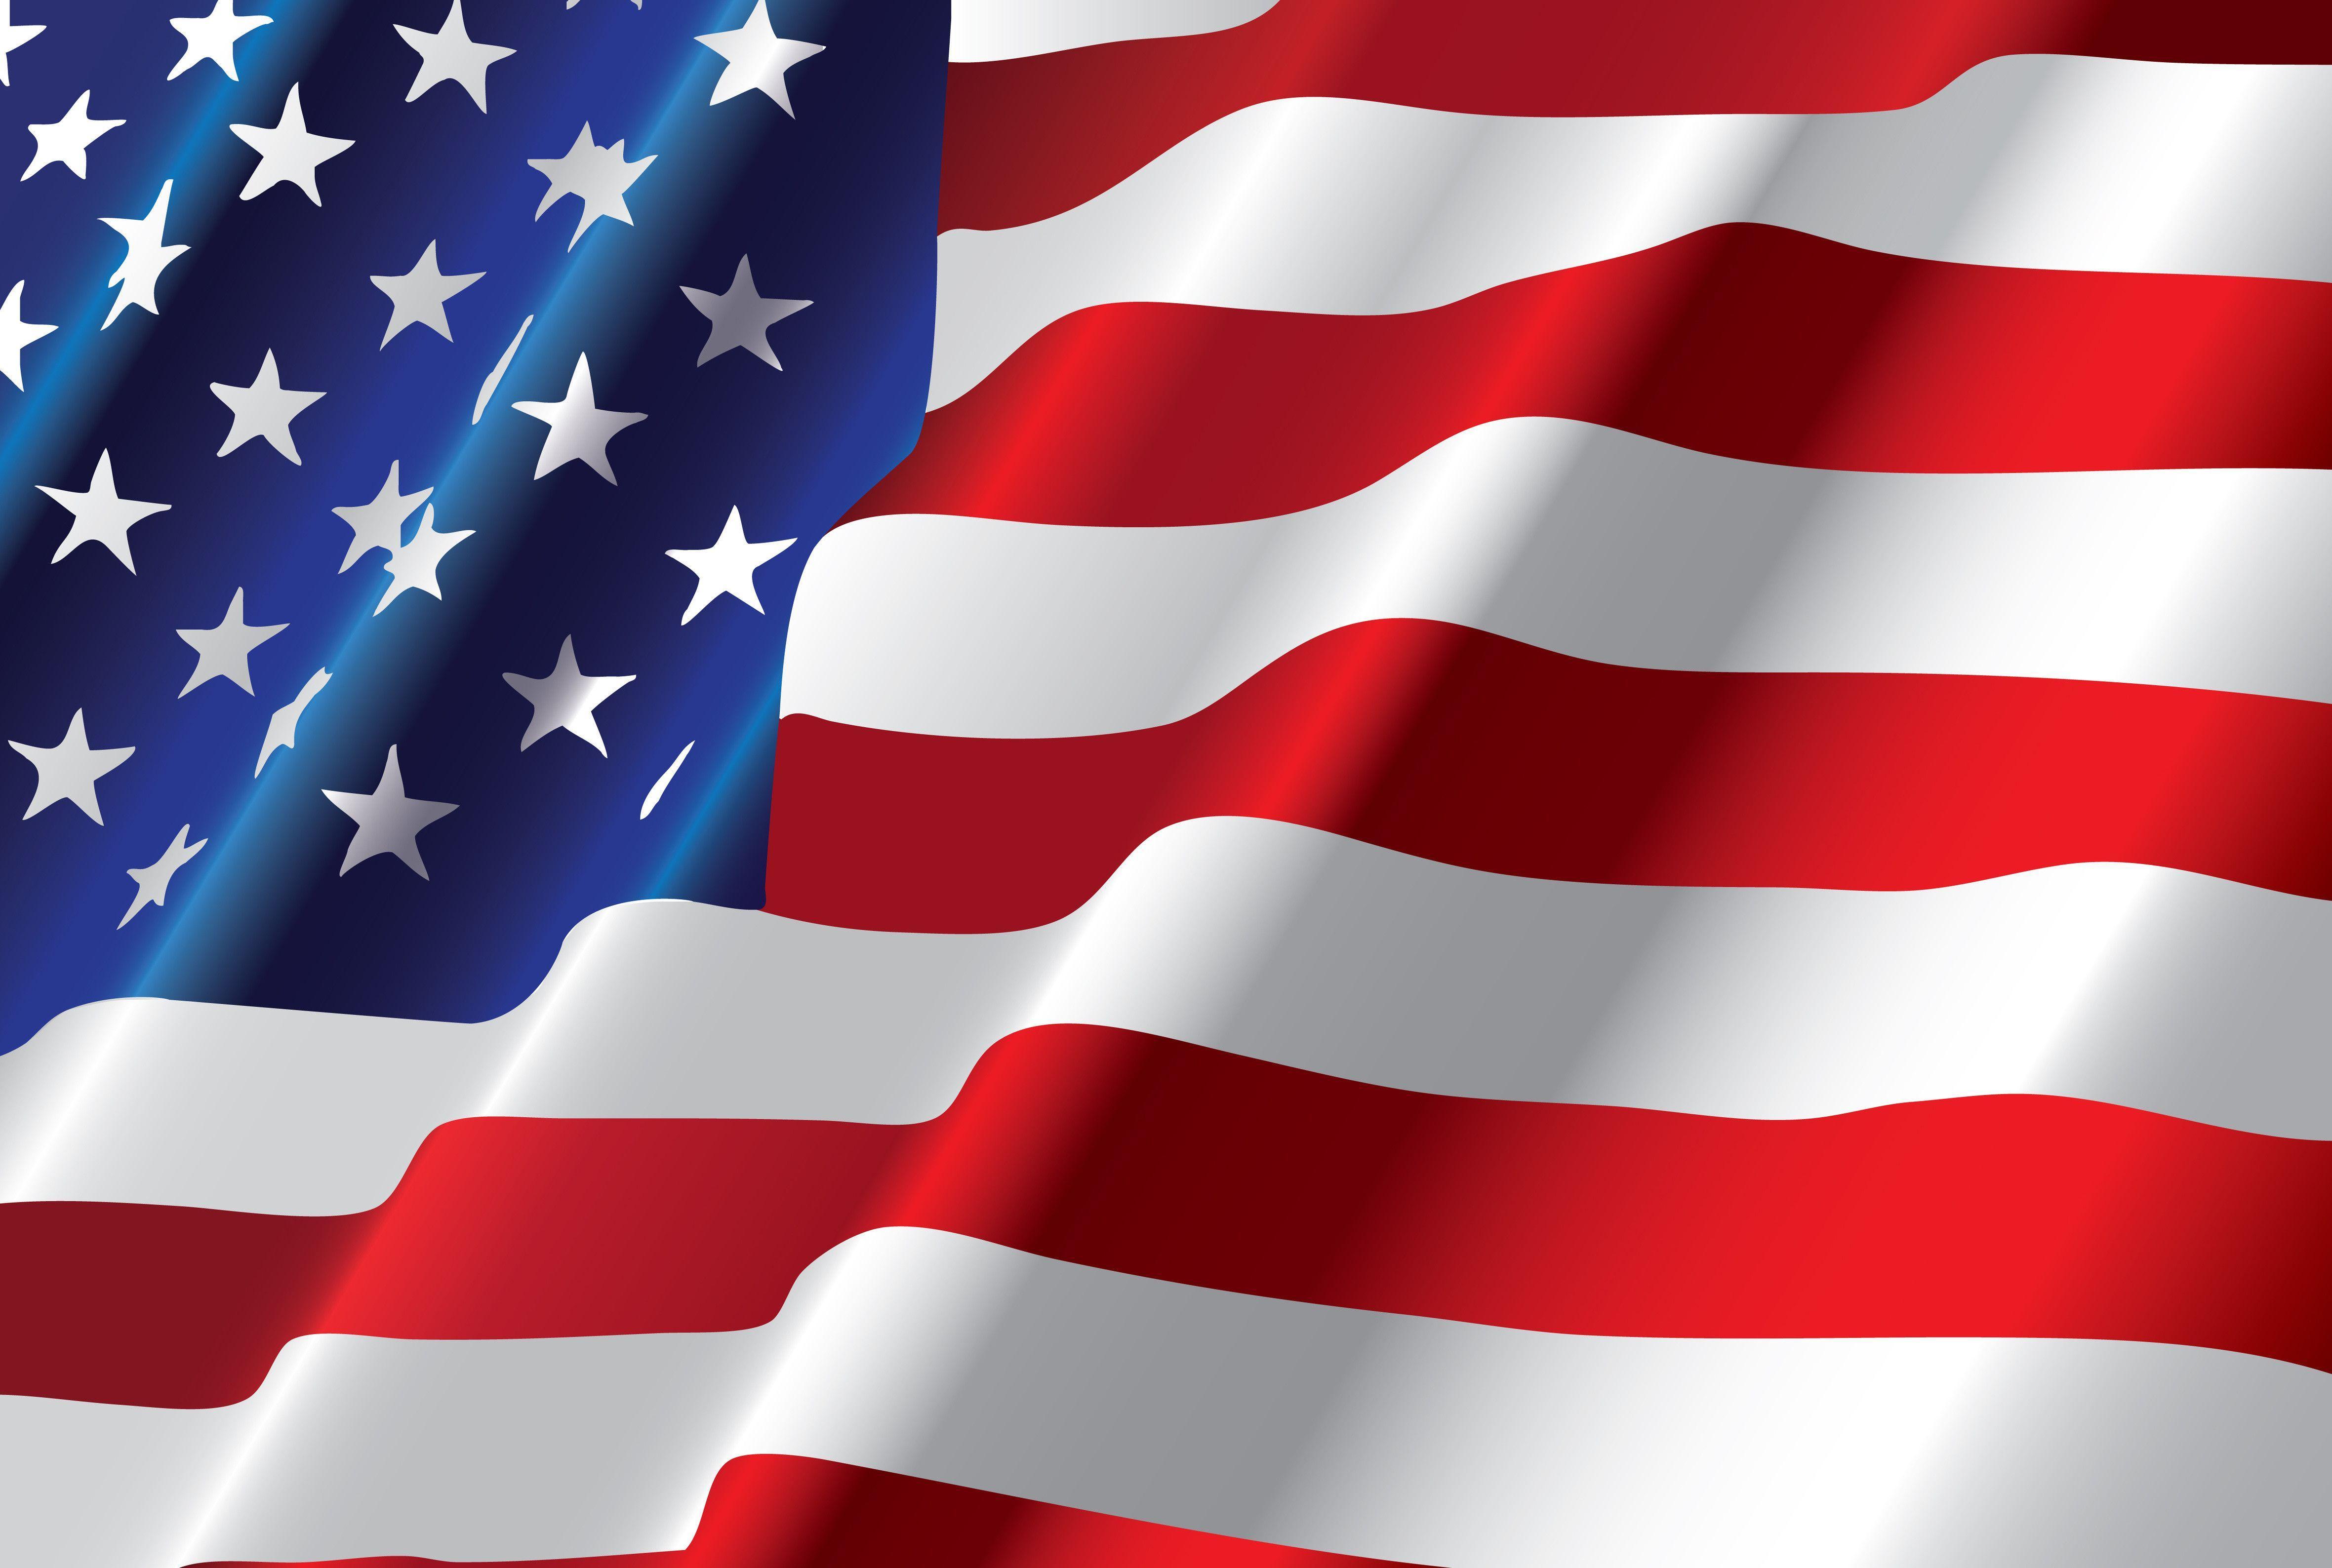 American Flag Desktop Backgrounds 4722x3176